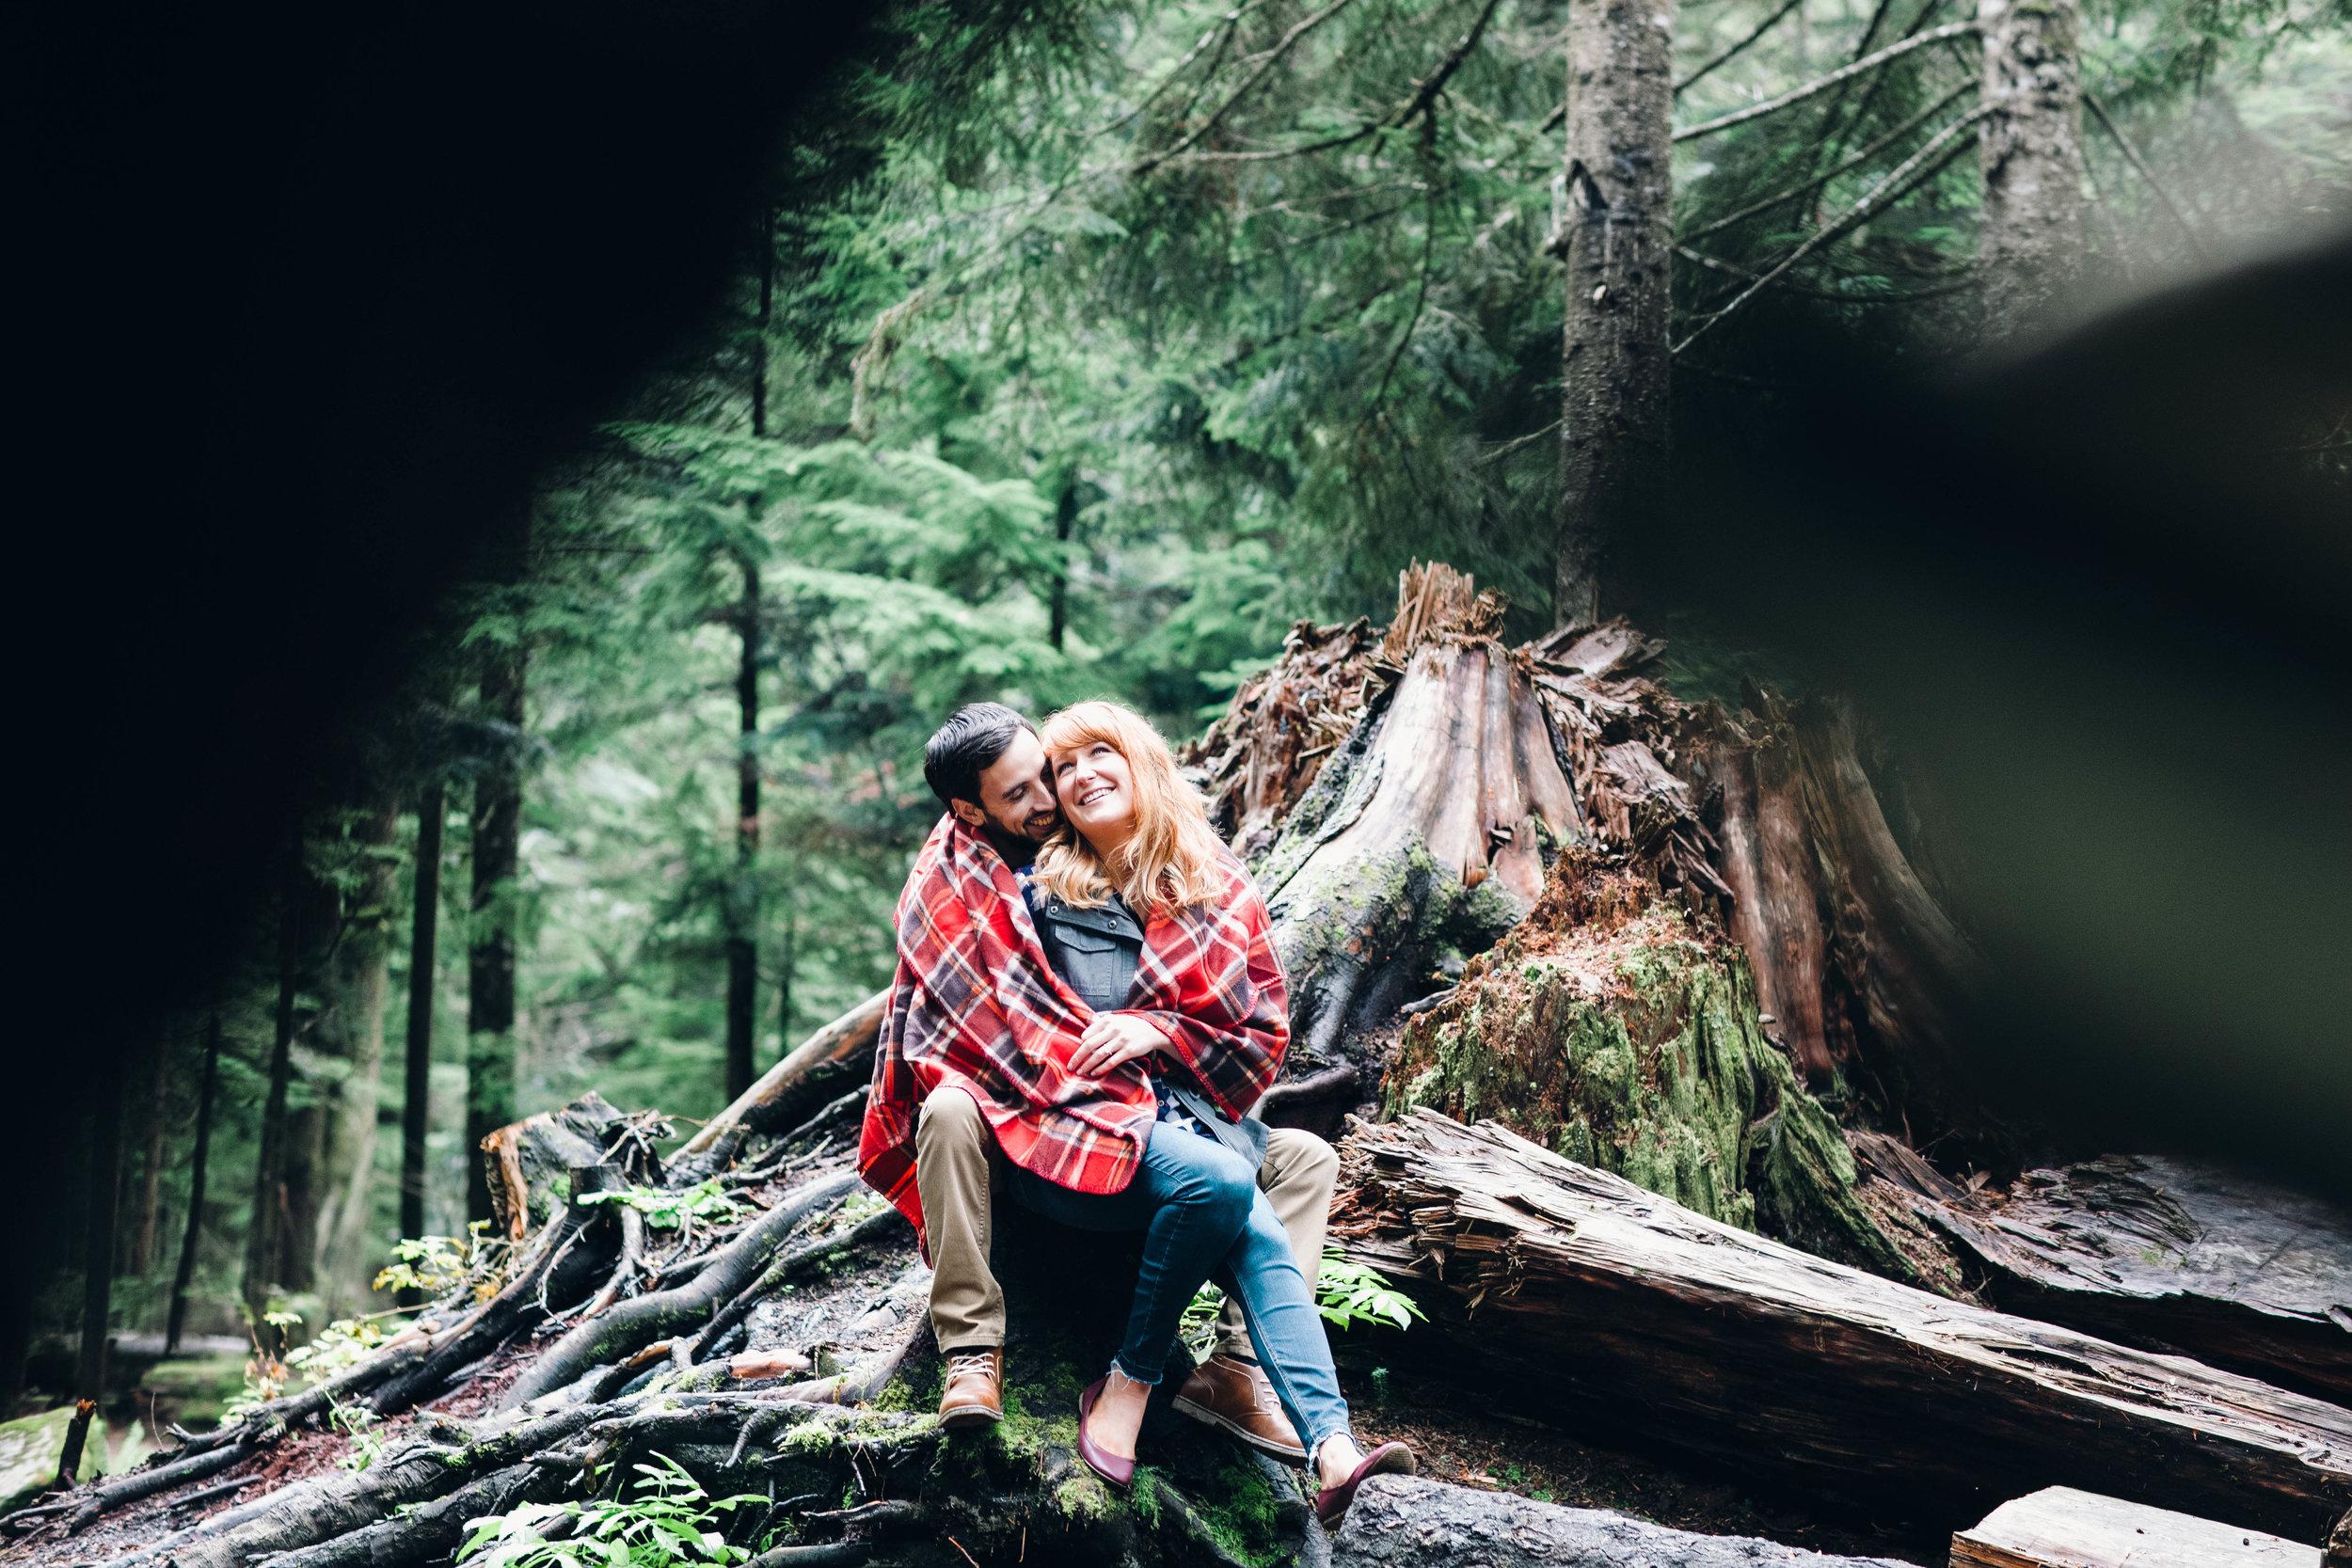 Ryan+Nicole_Franklin+Falls+Engagement_APW2016_25.JPG